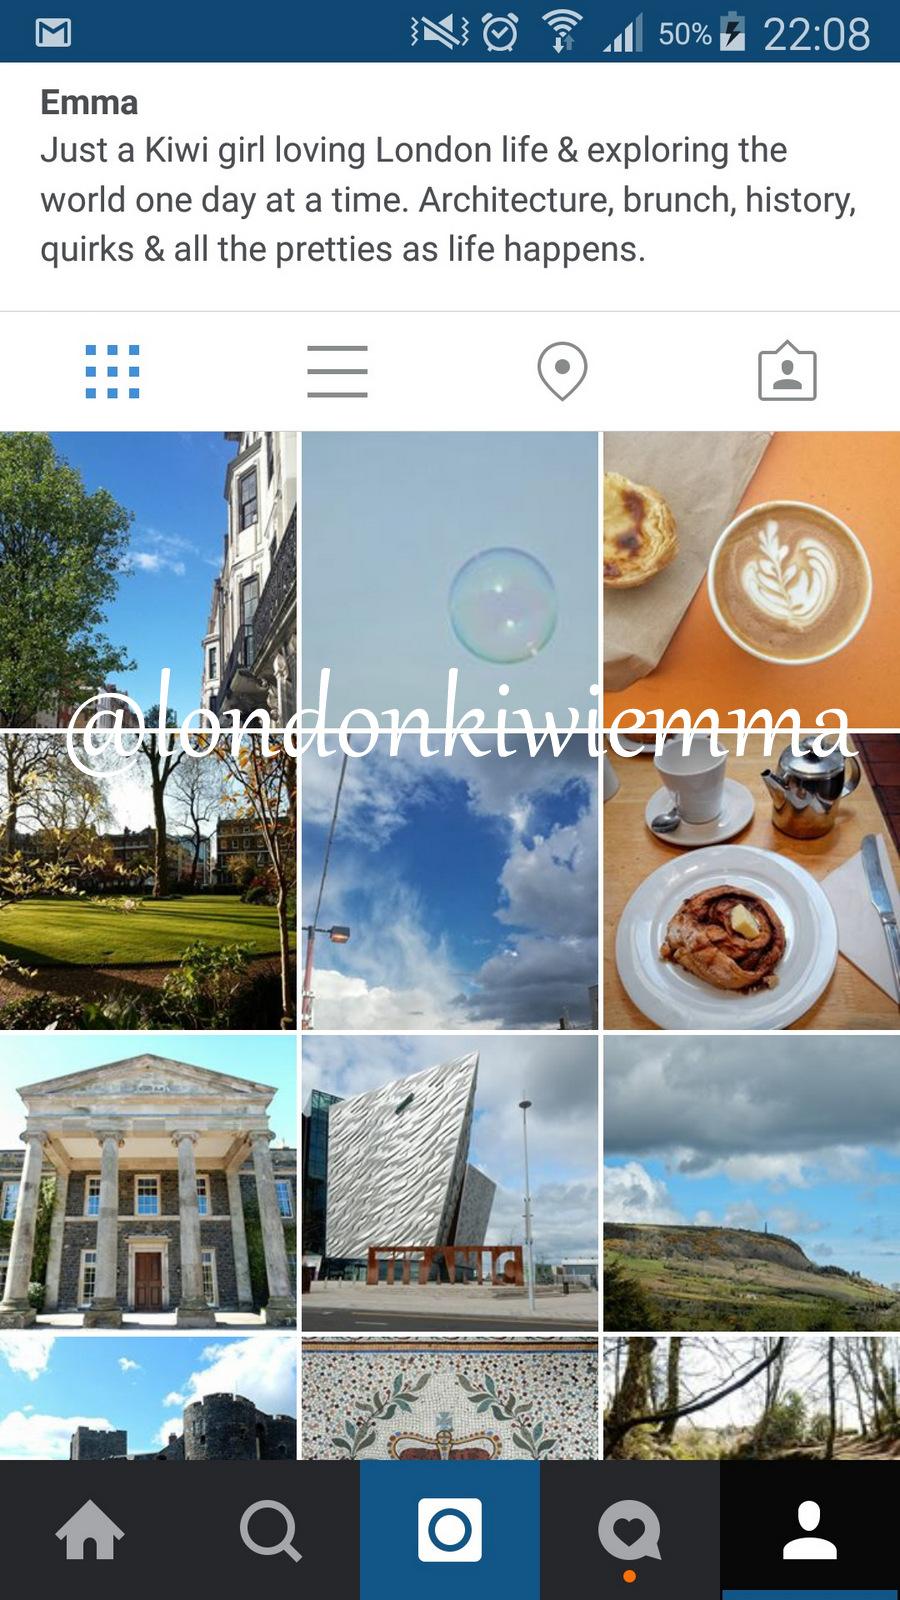 Instagram @londonkiwiemma Adventures of a London Kiwi